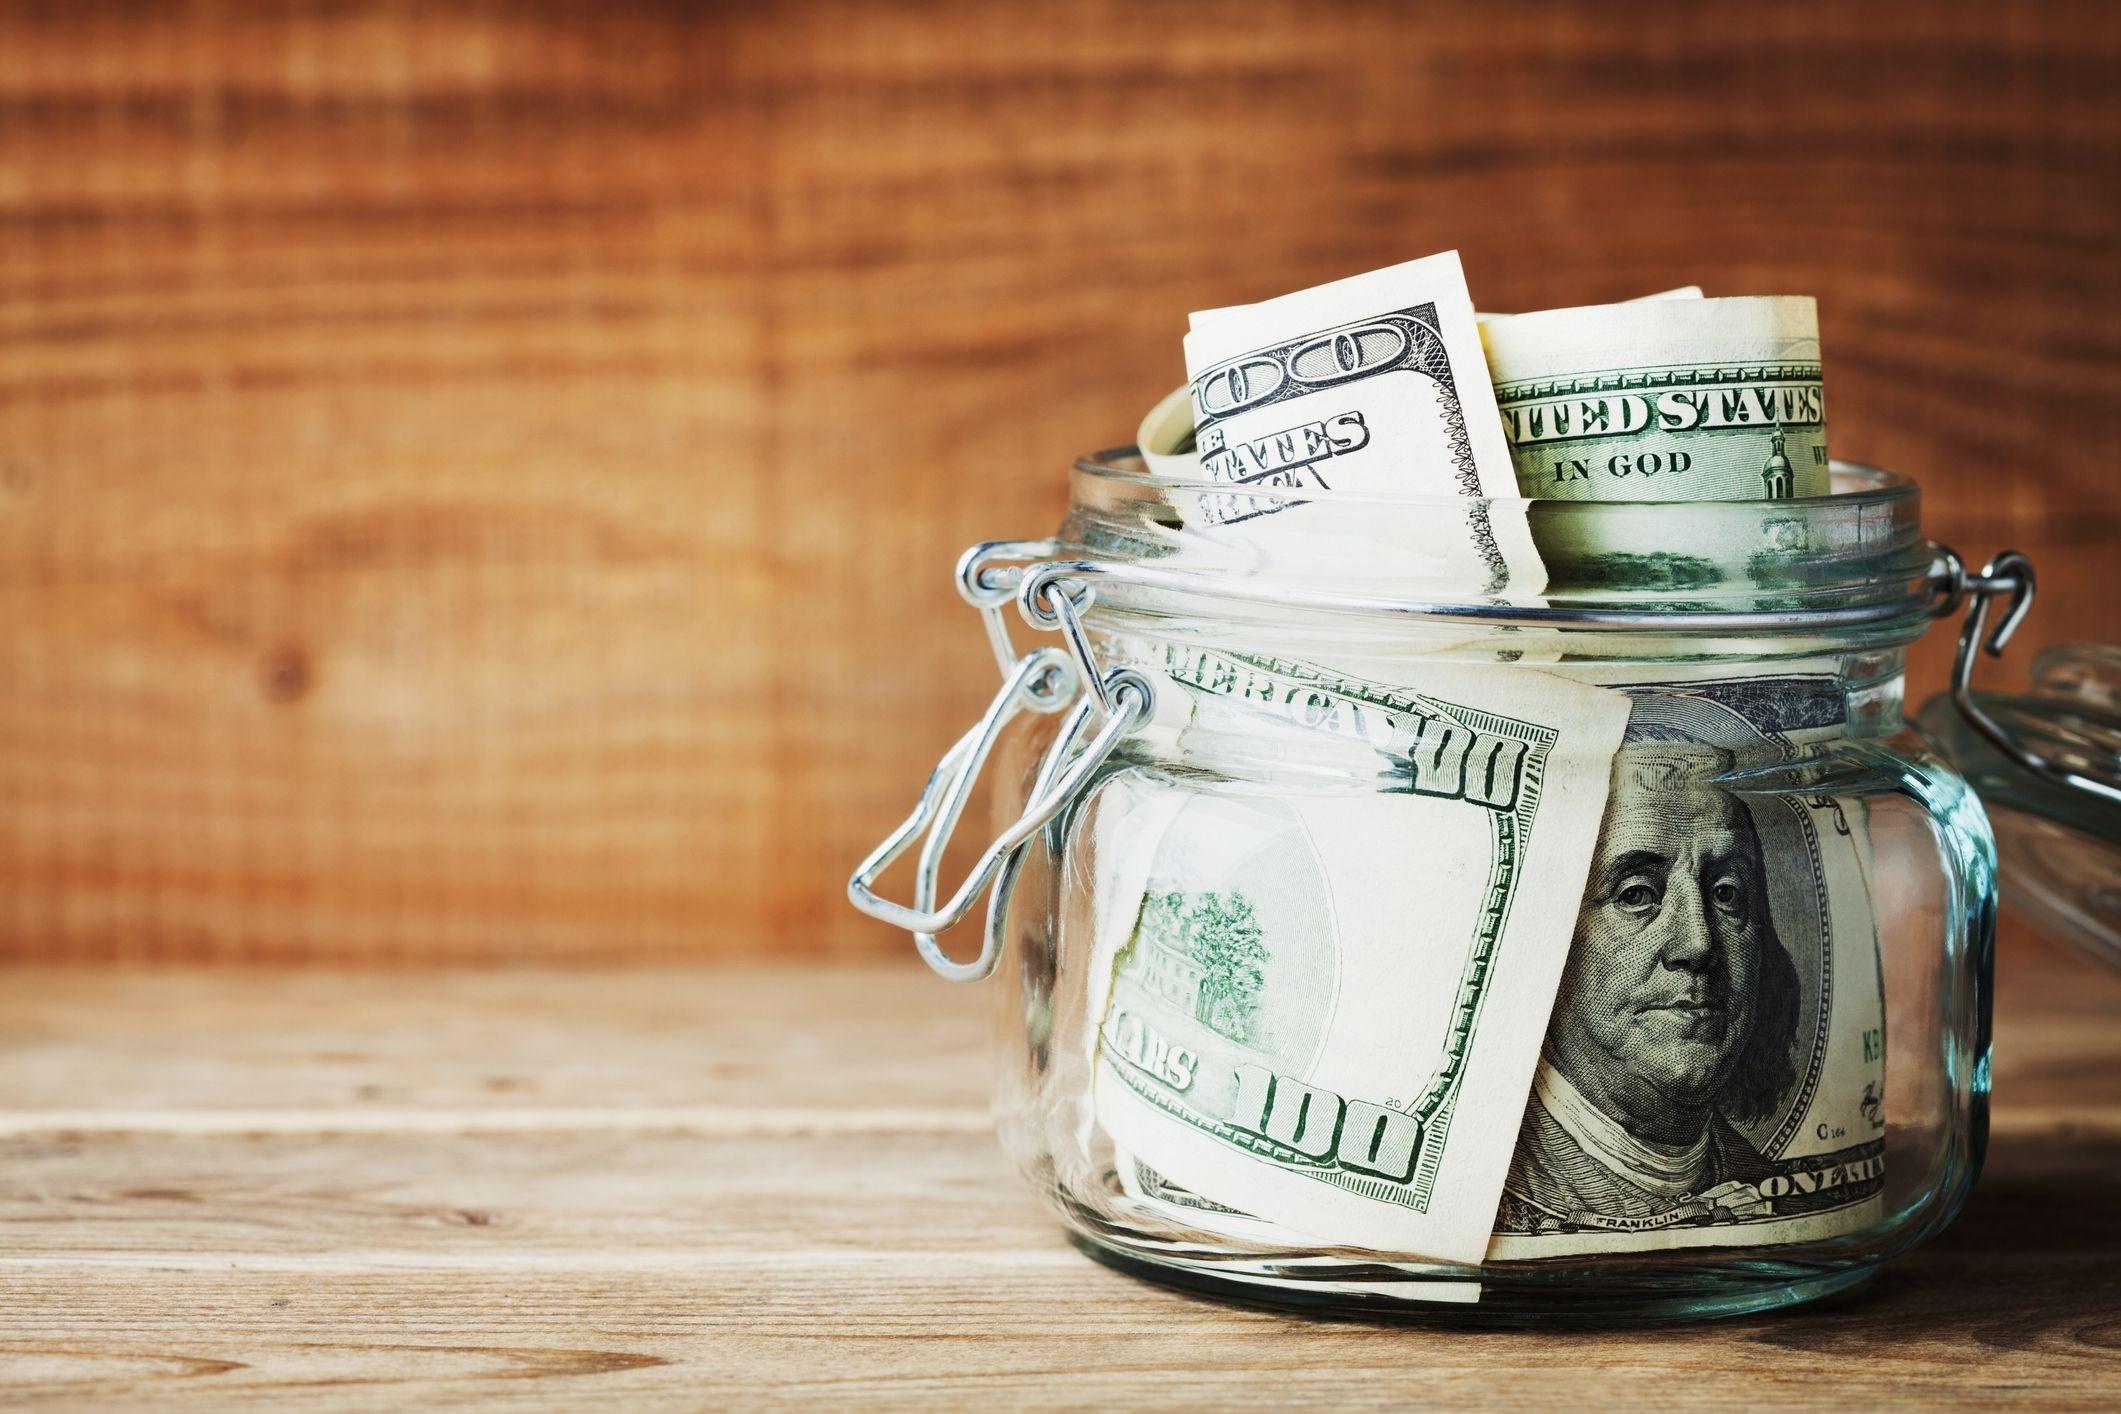 Jar full of $100 bills